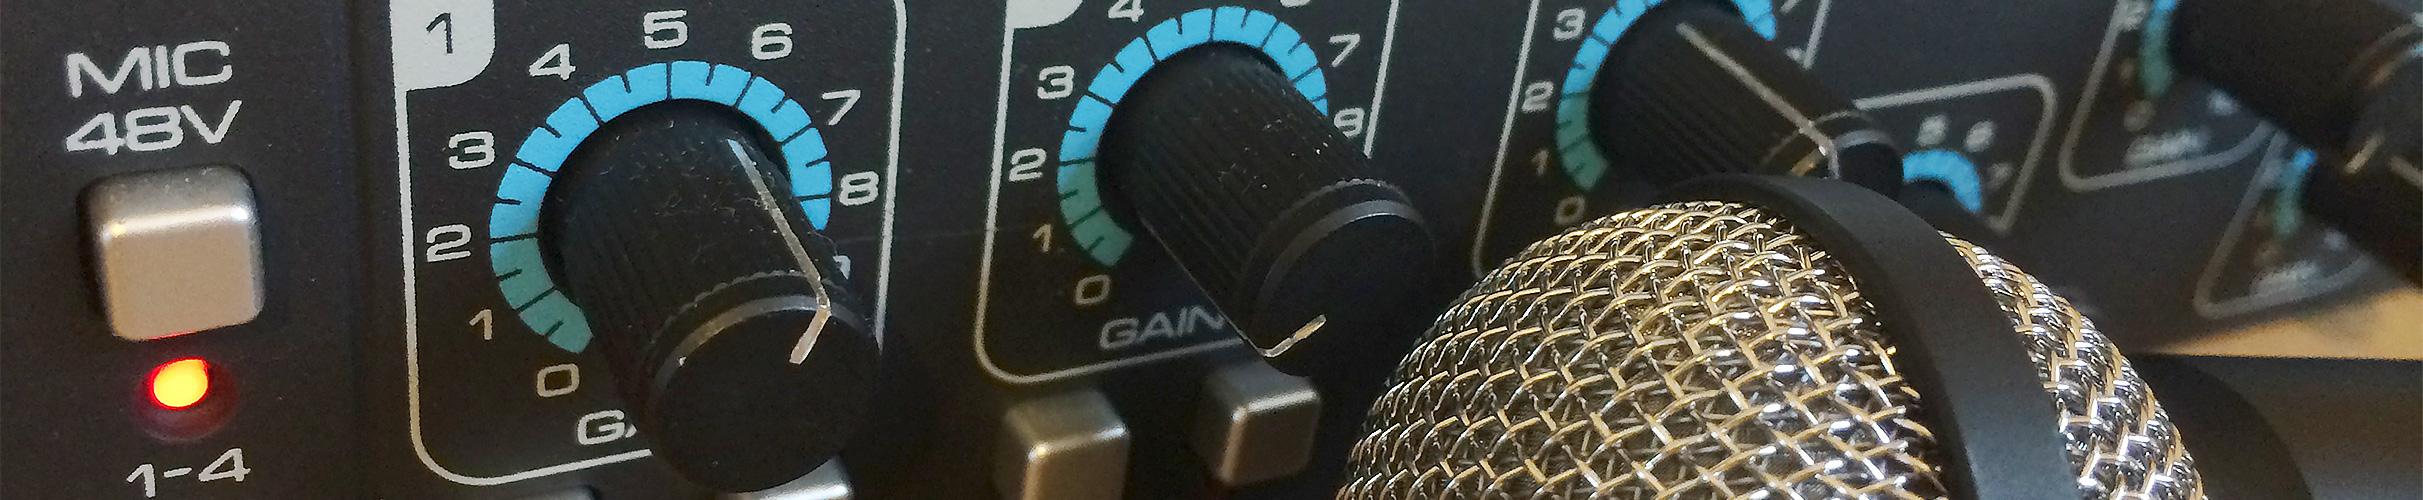 genius-home-slide-mic